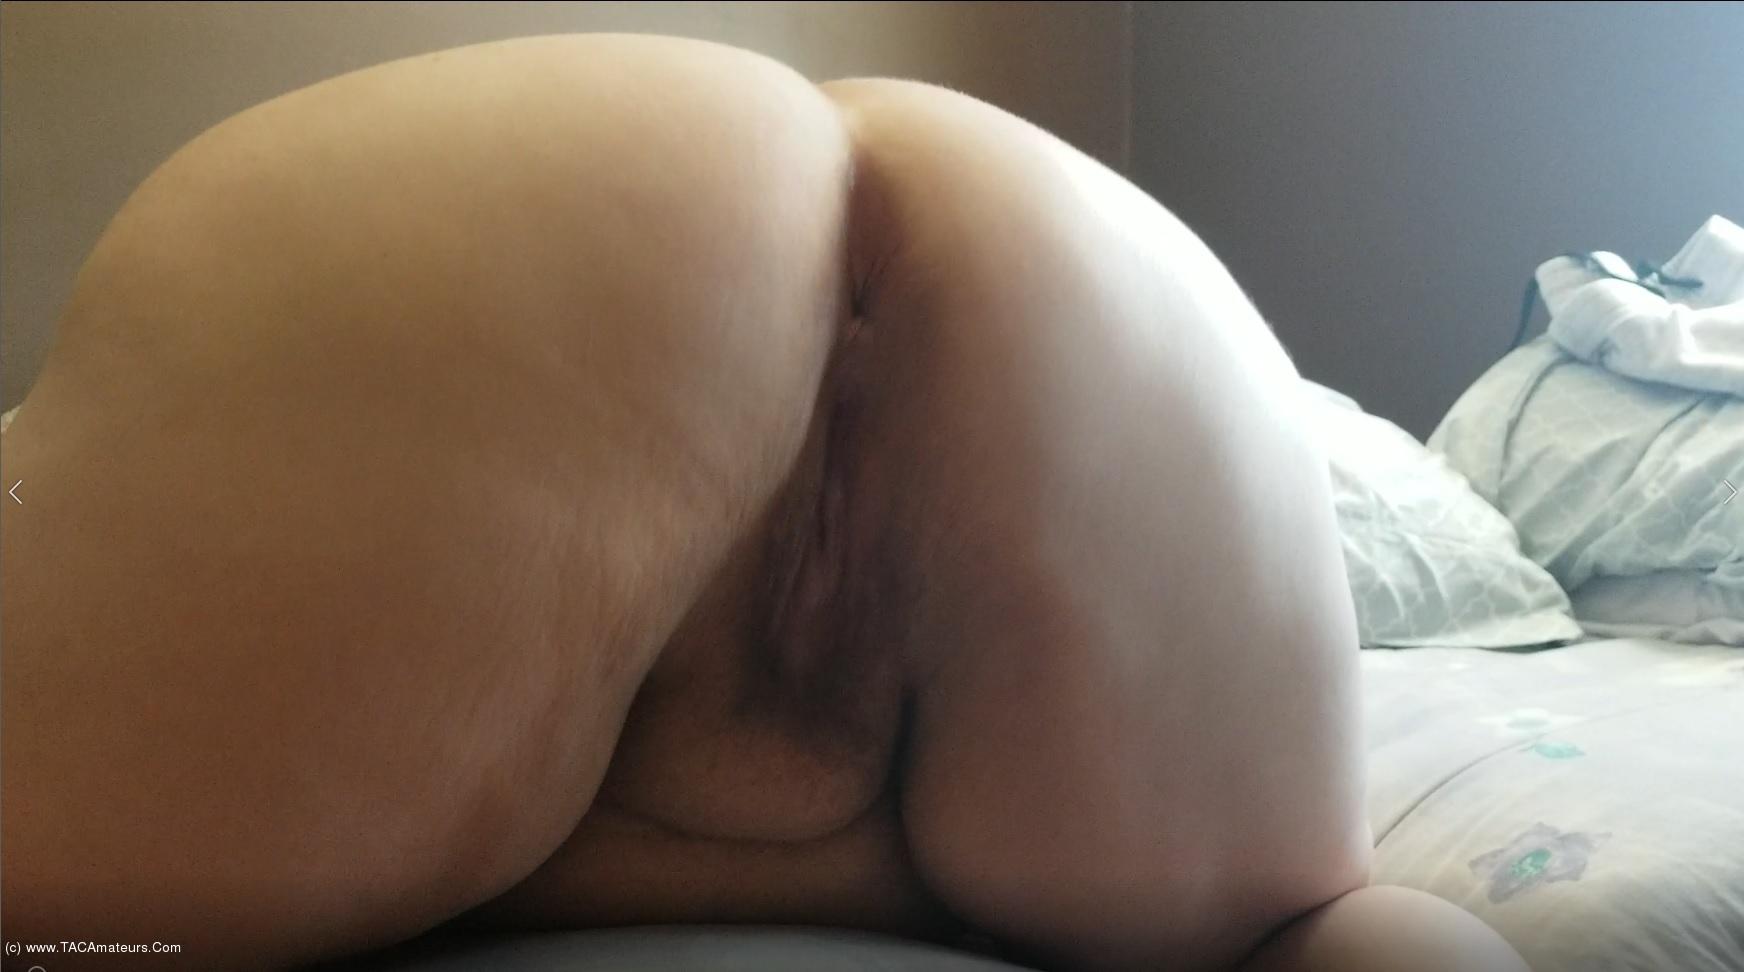 SexyNEBBW - Arsehole Getting Cum Pt1 scene 1